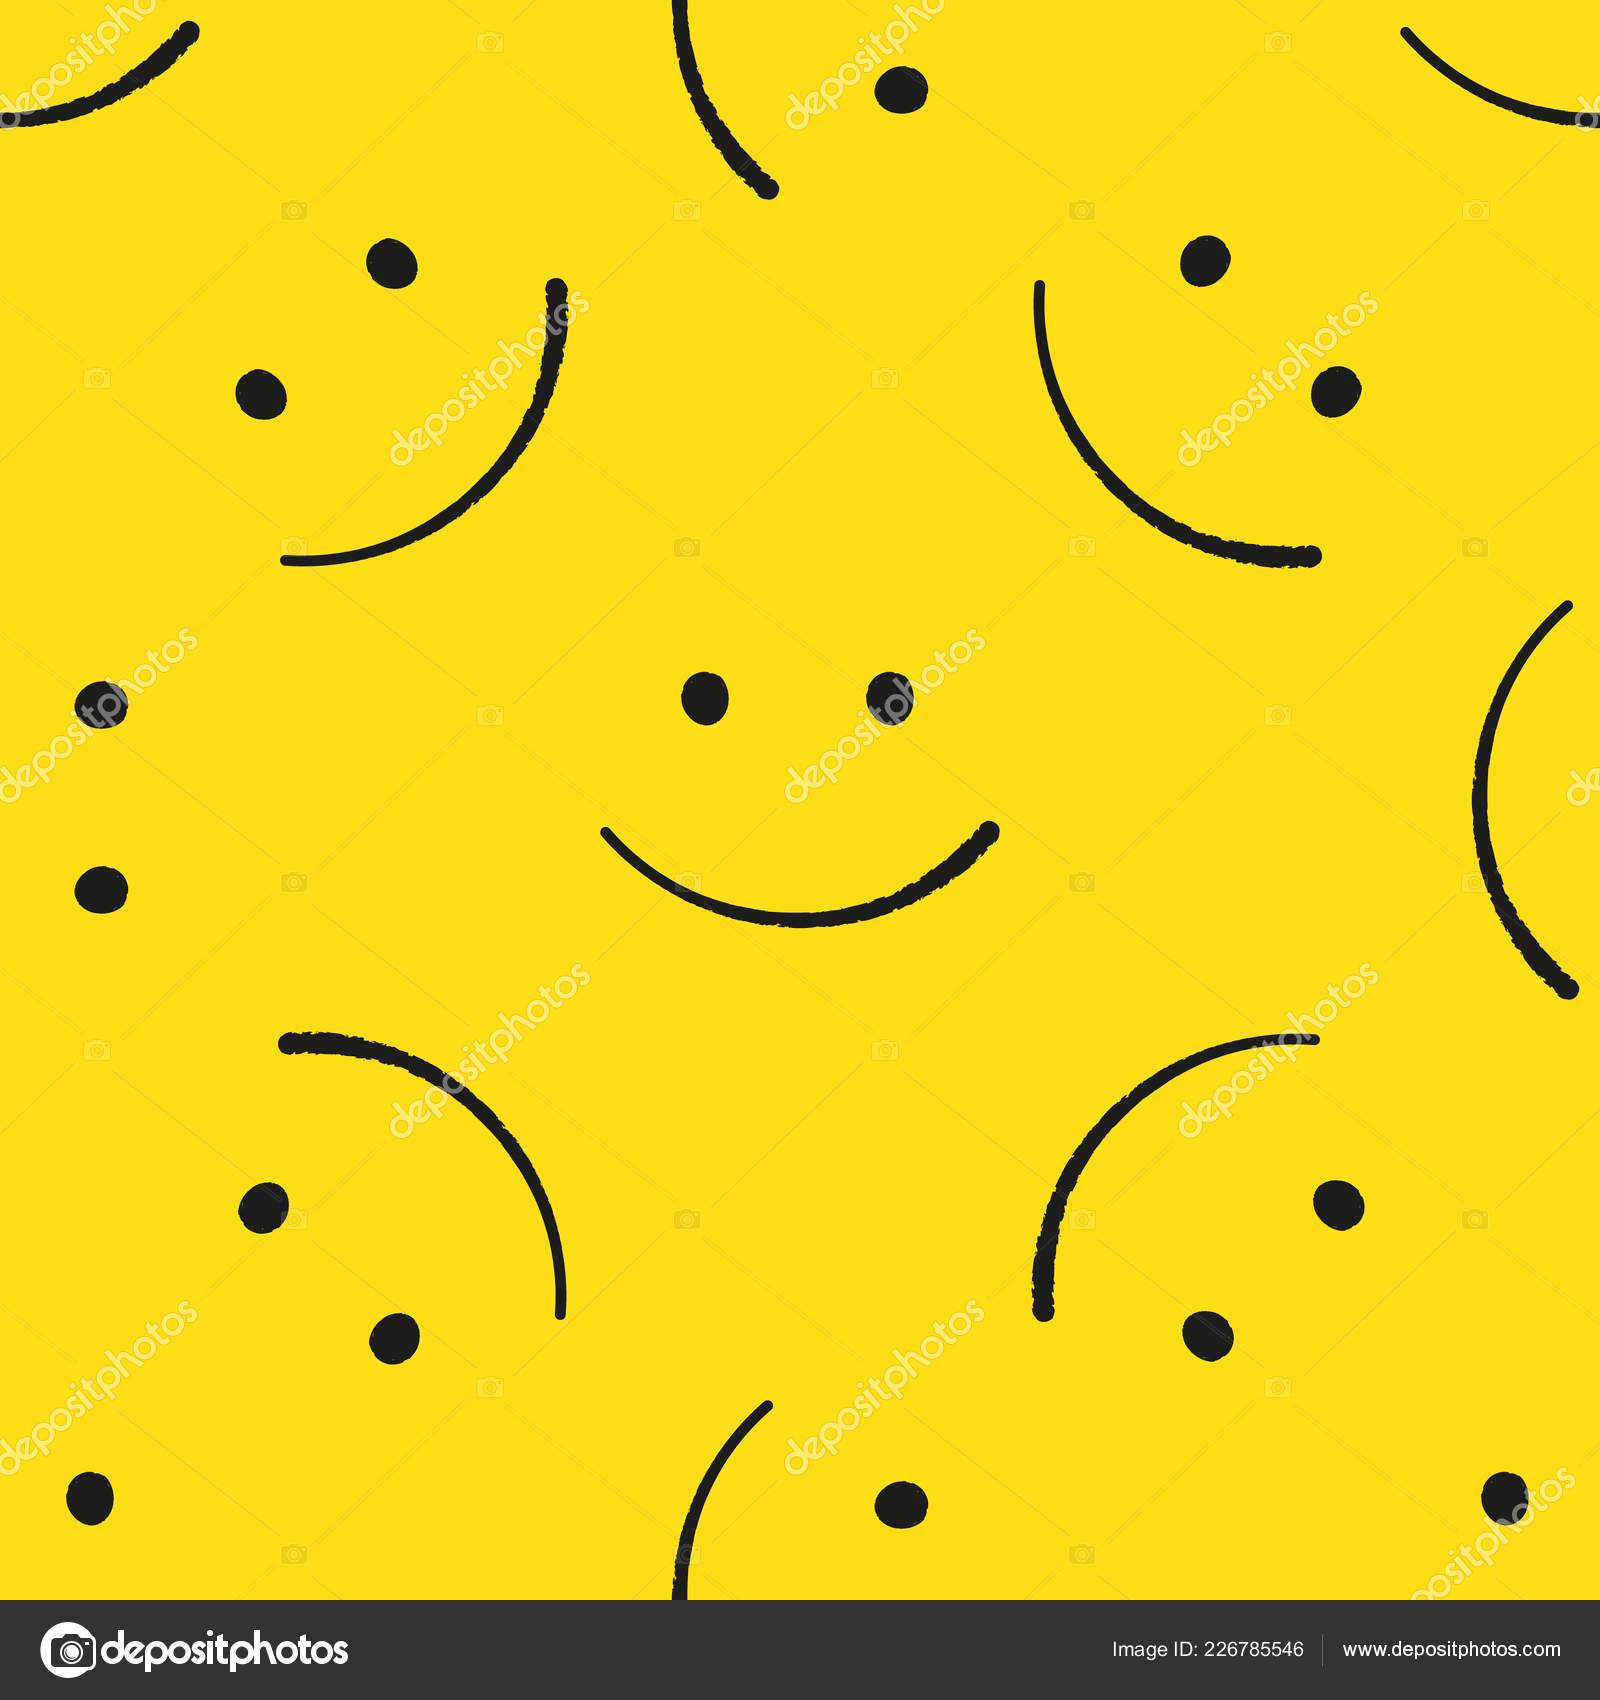 Modele Sans Couture D Emoticones Emoji Jaune Fond De